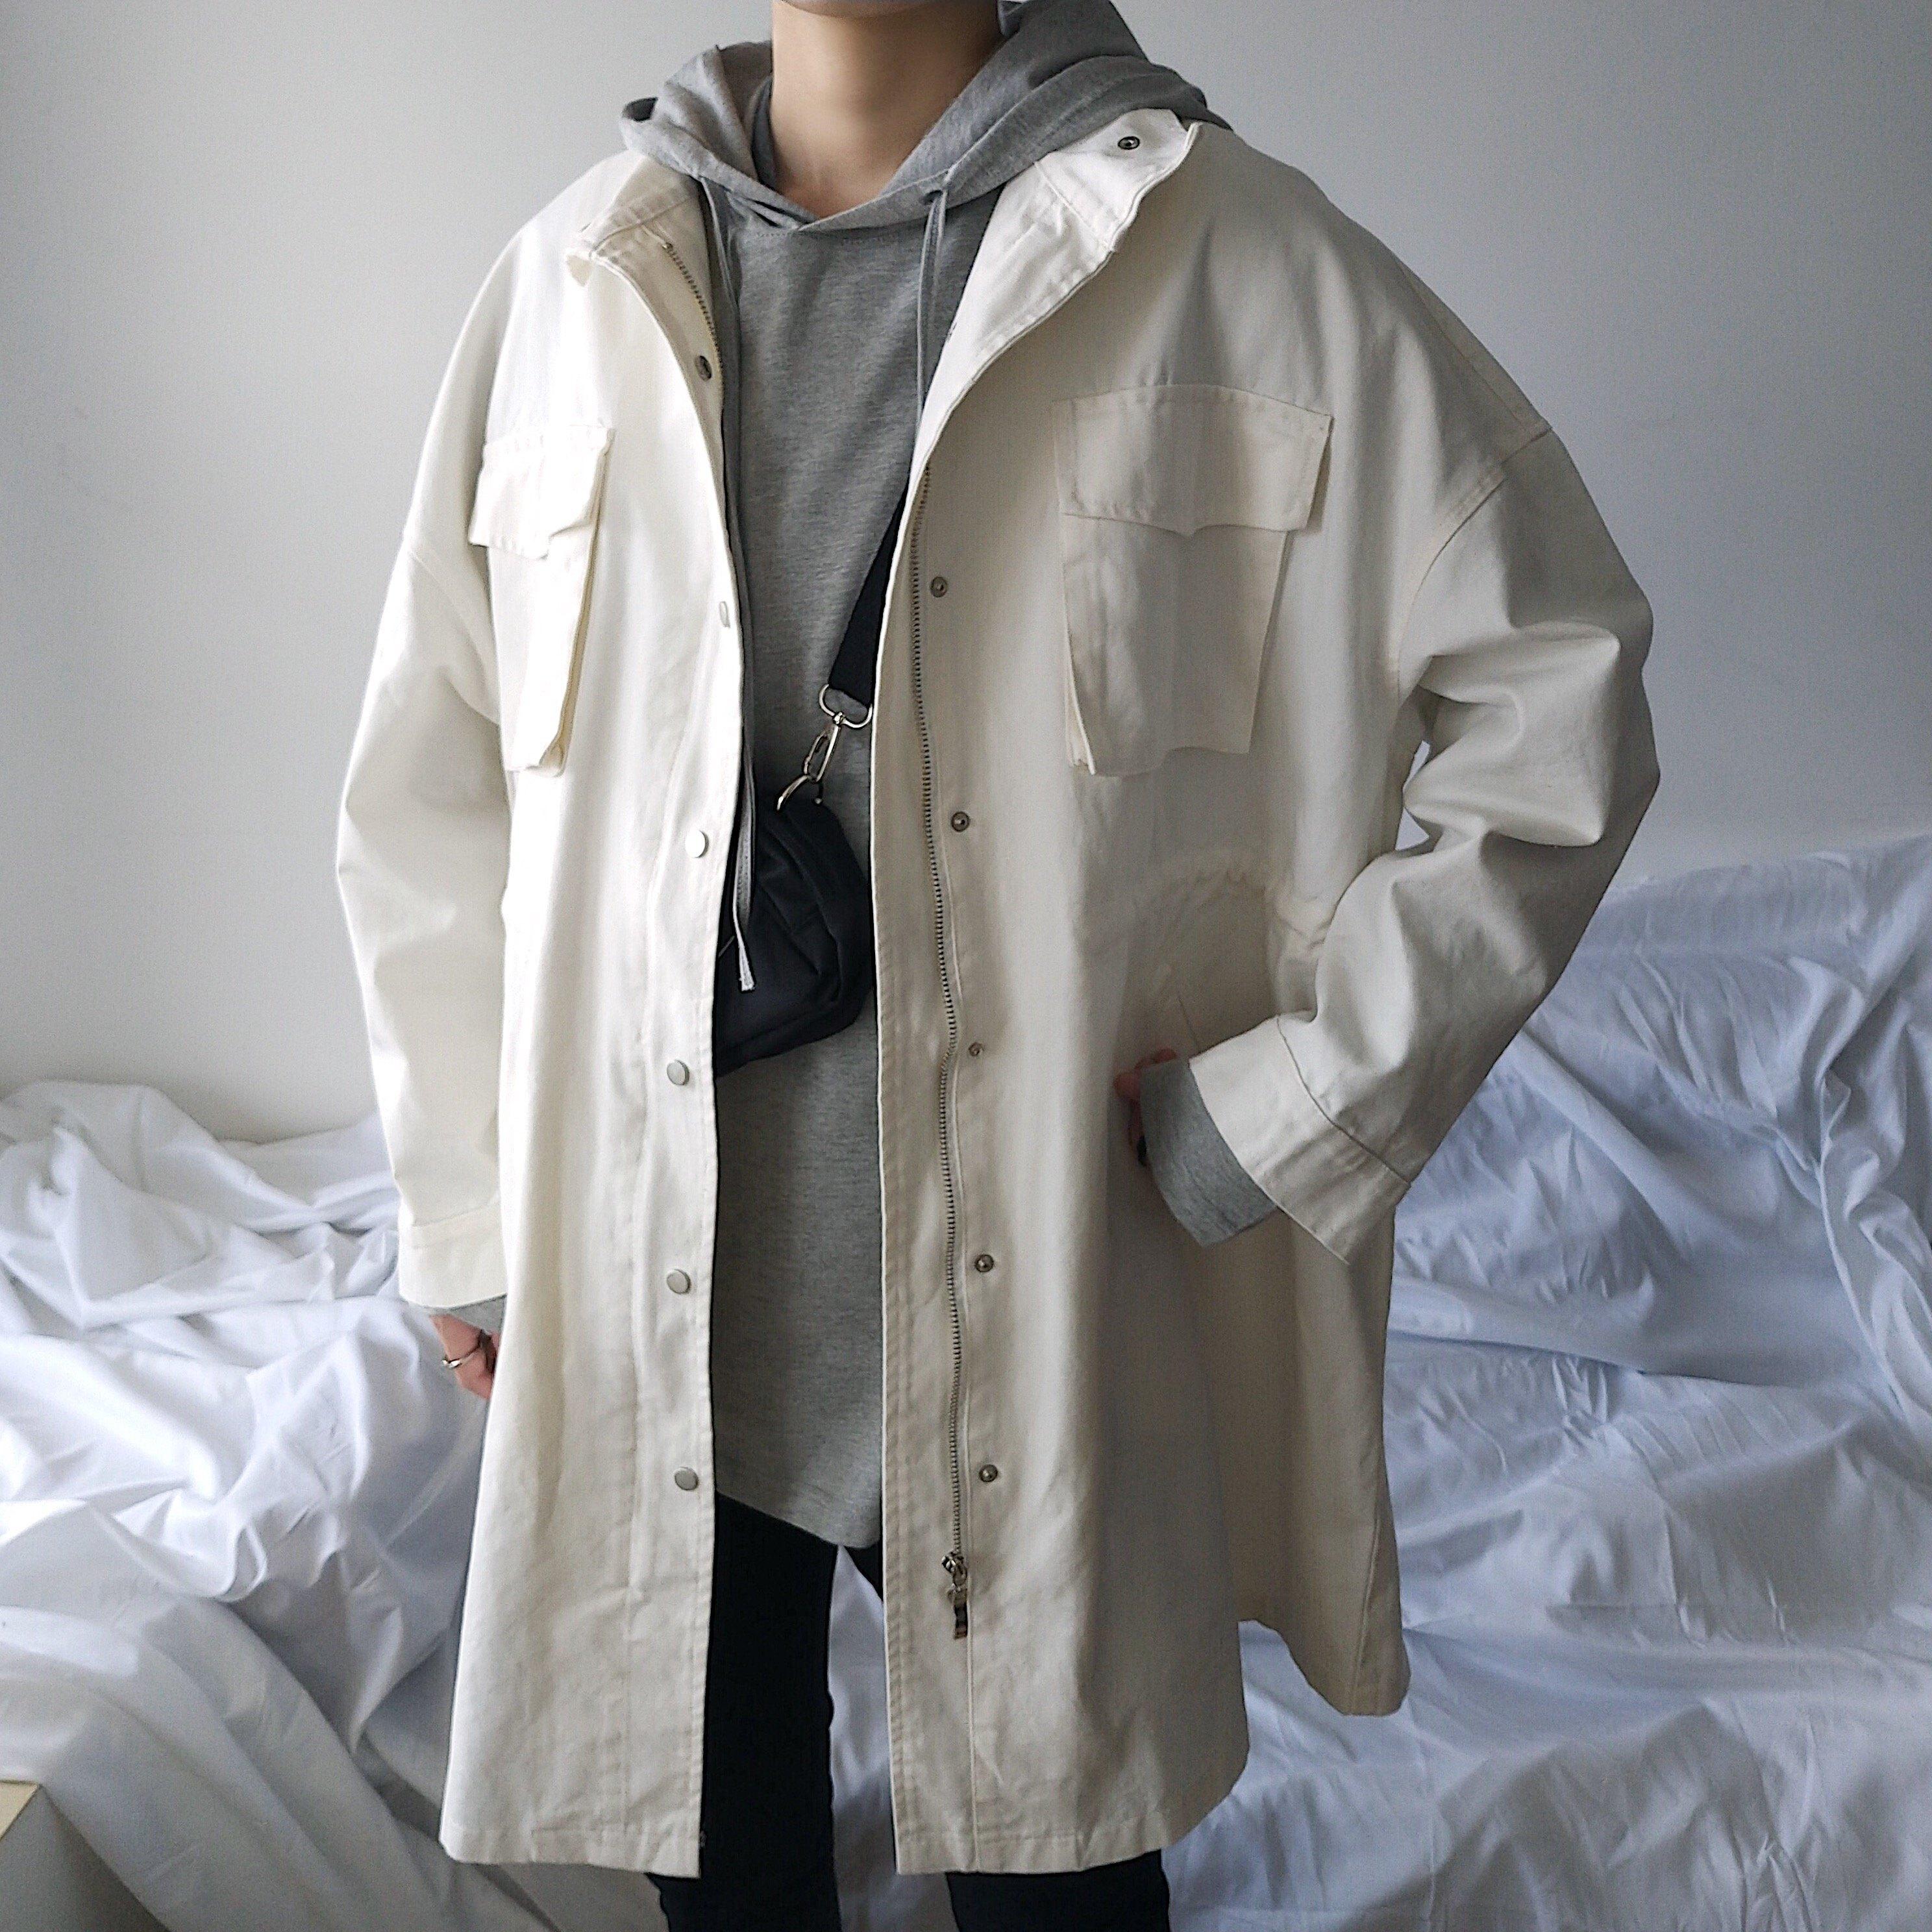 FINDSENSE品牌 質感  好料質 長版外搭 口袋 上衣 風衣 長版透氣 外套